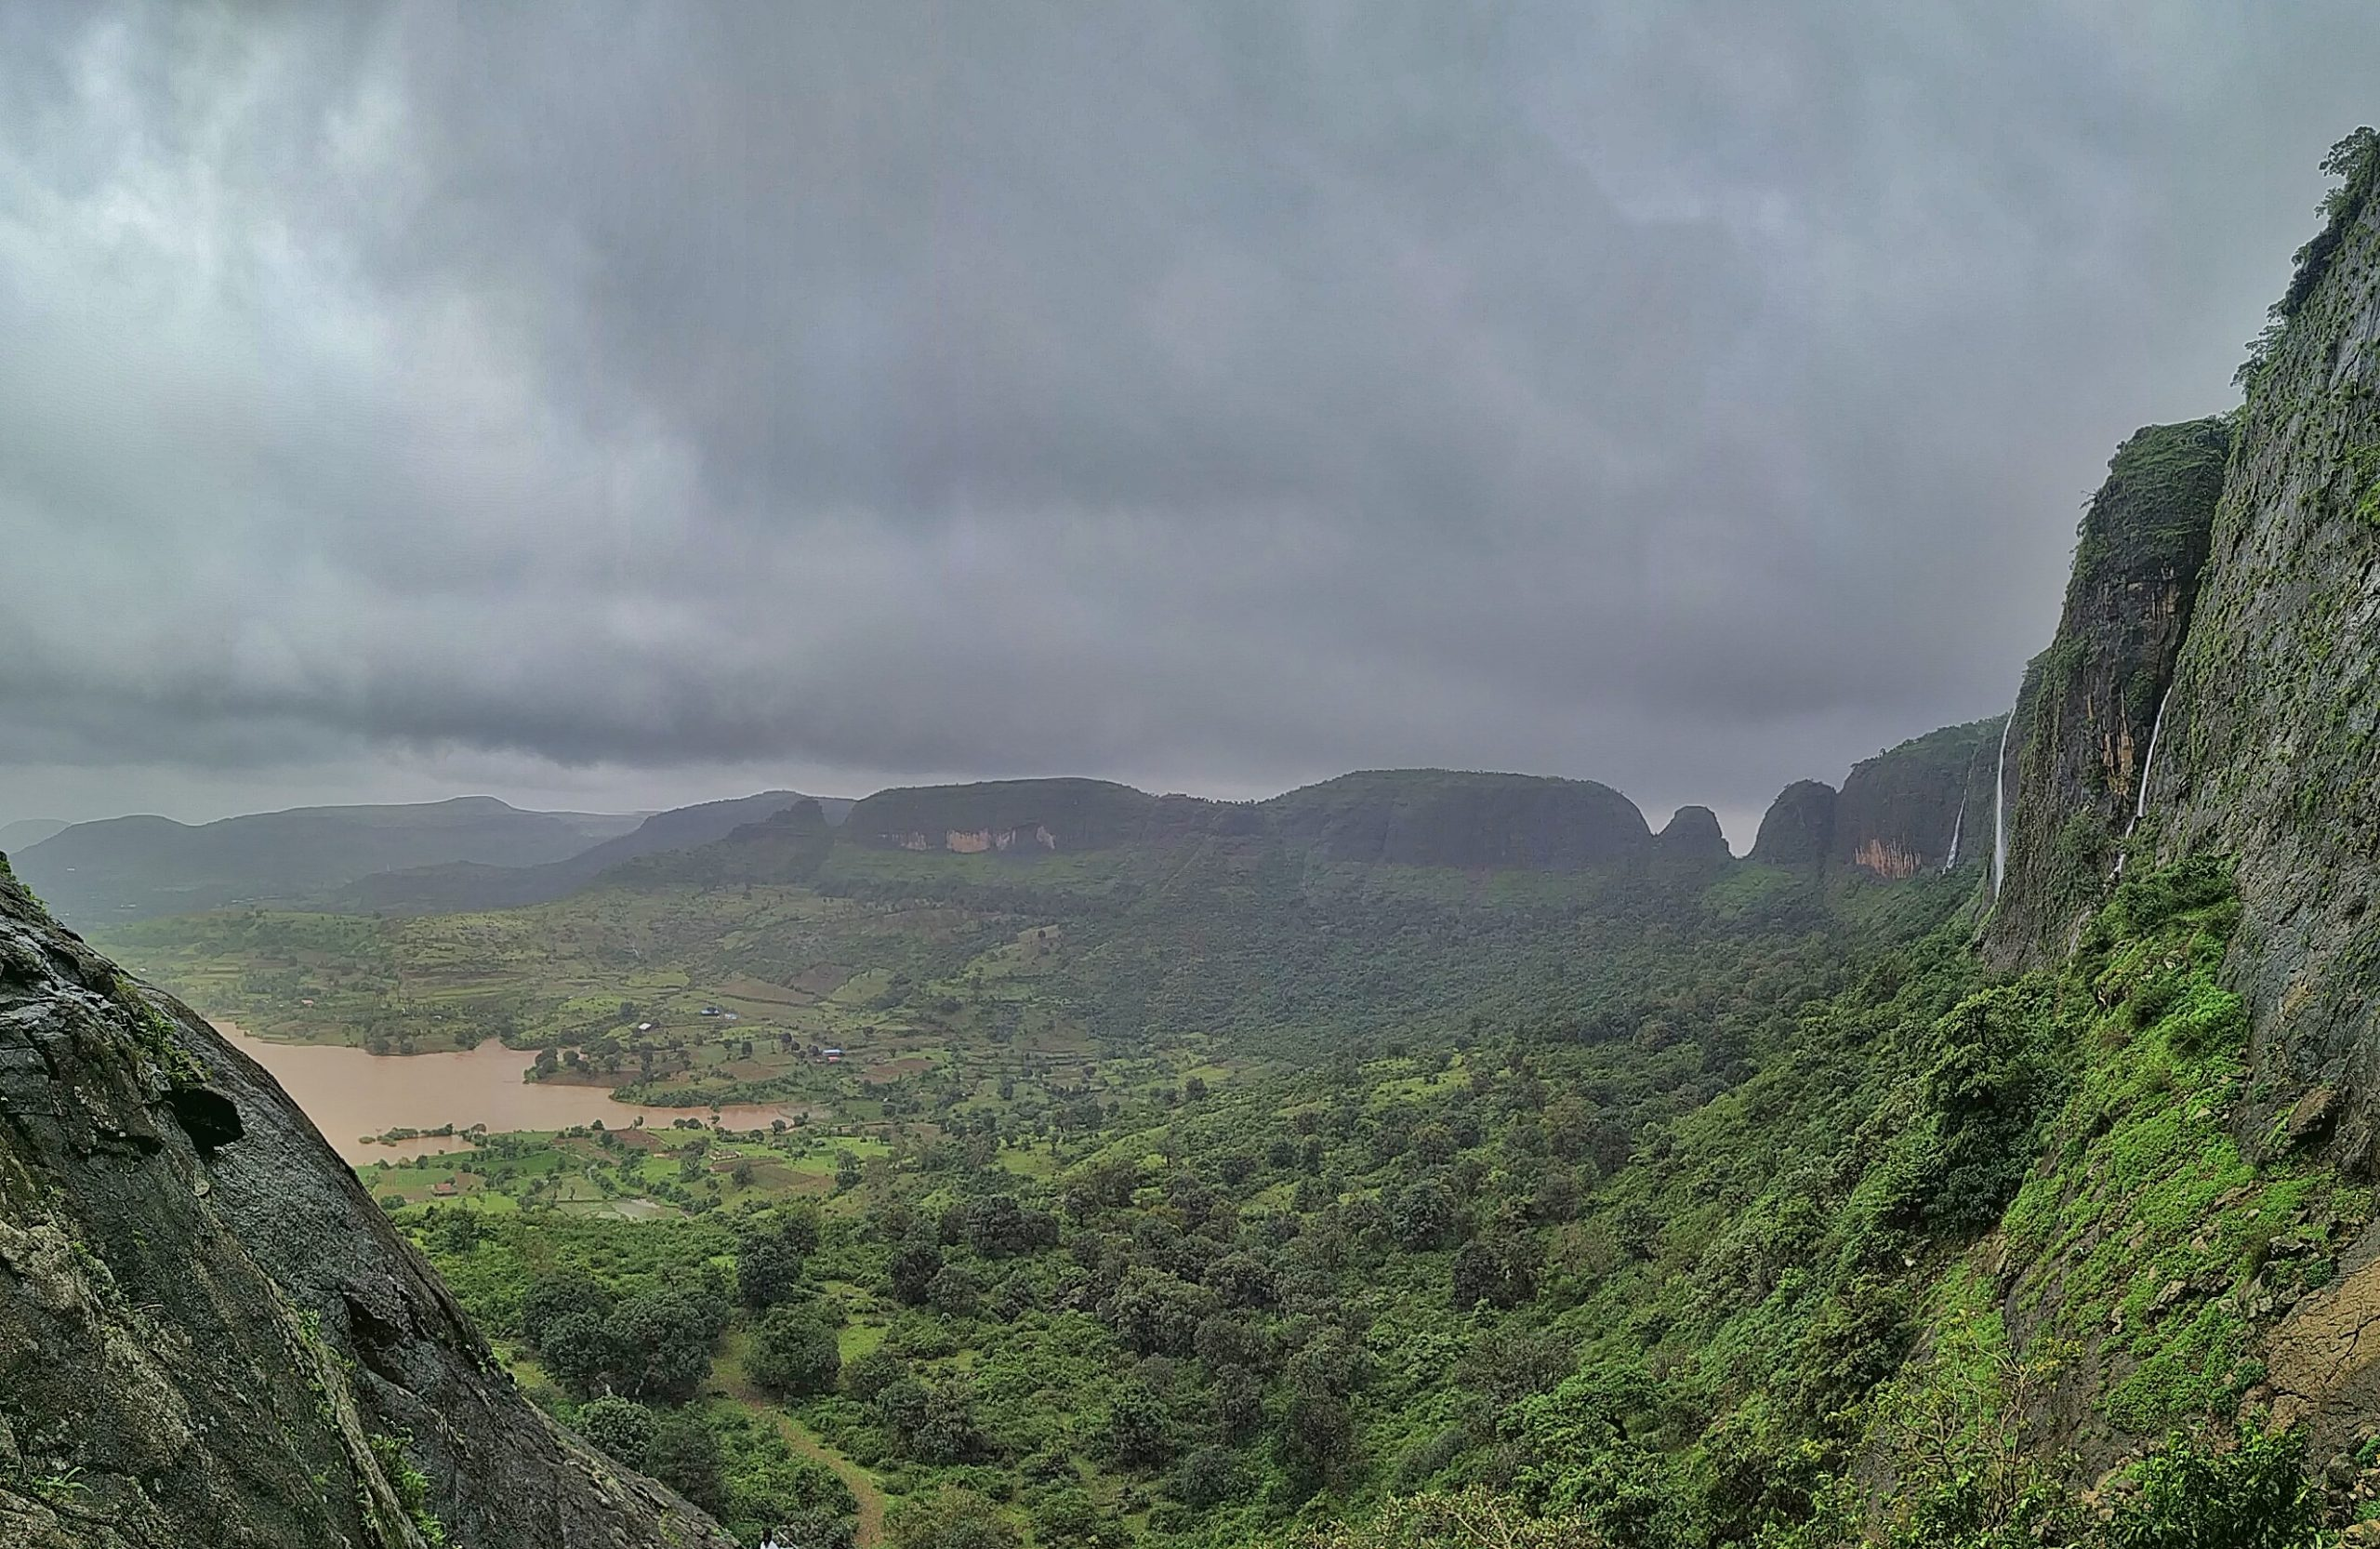 Sahyadri mountain range at Anjaneri